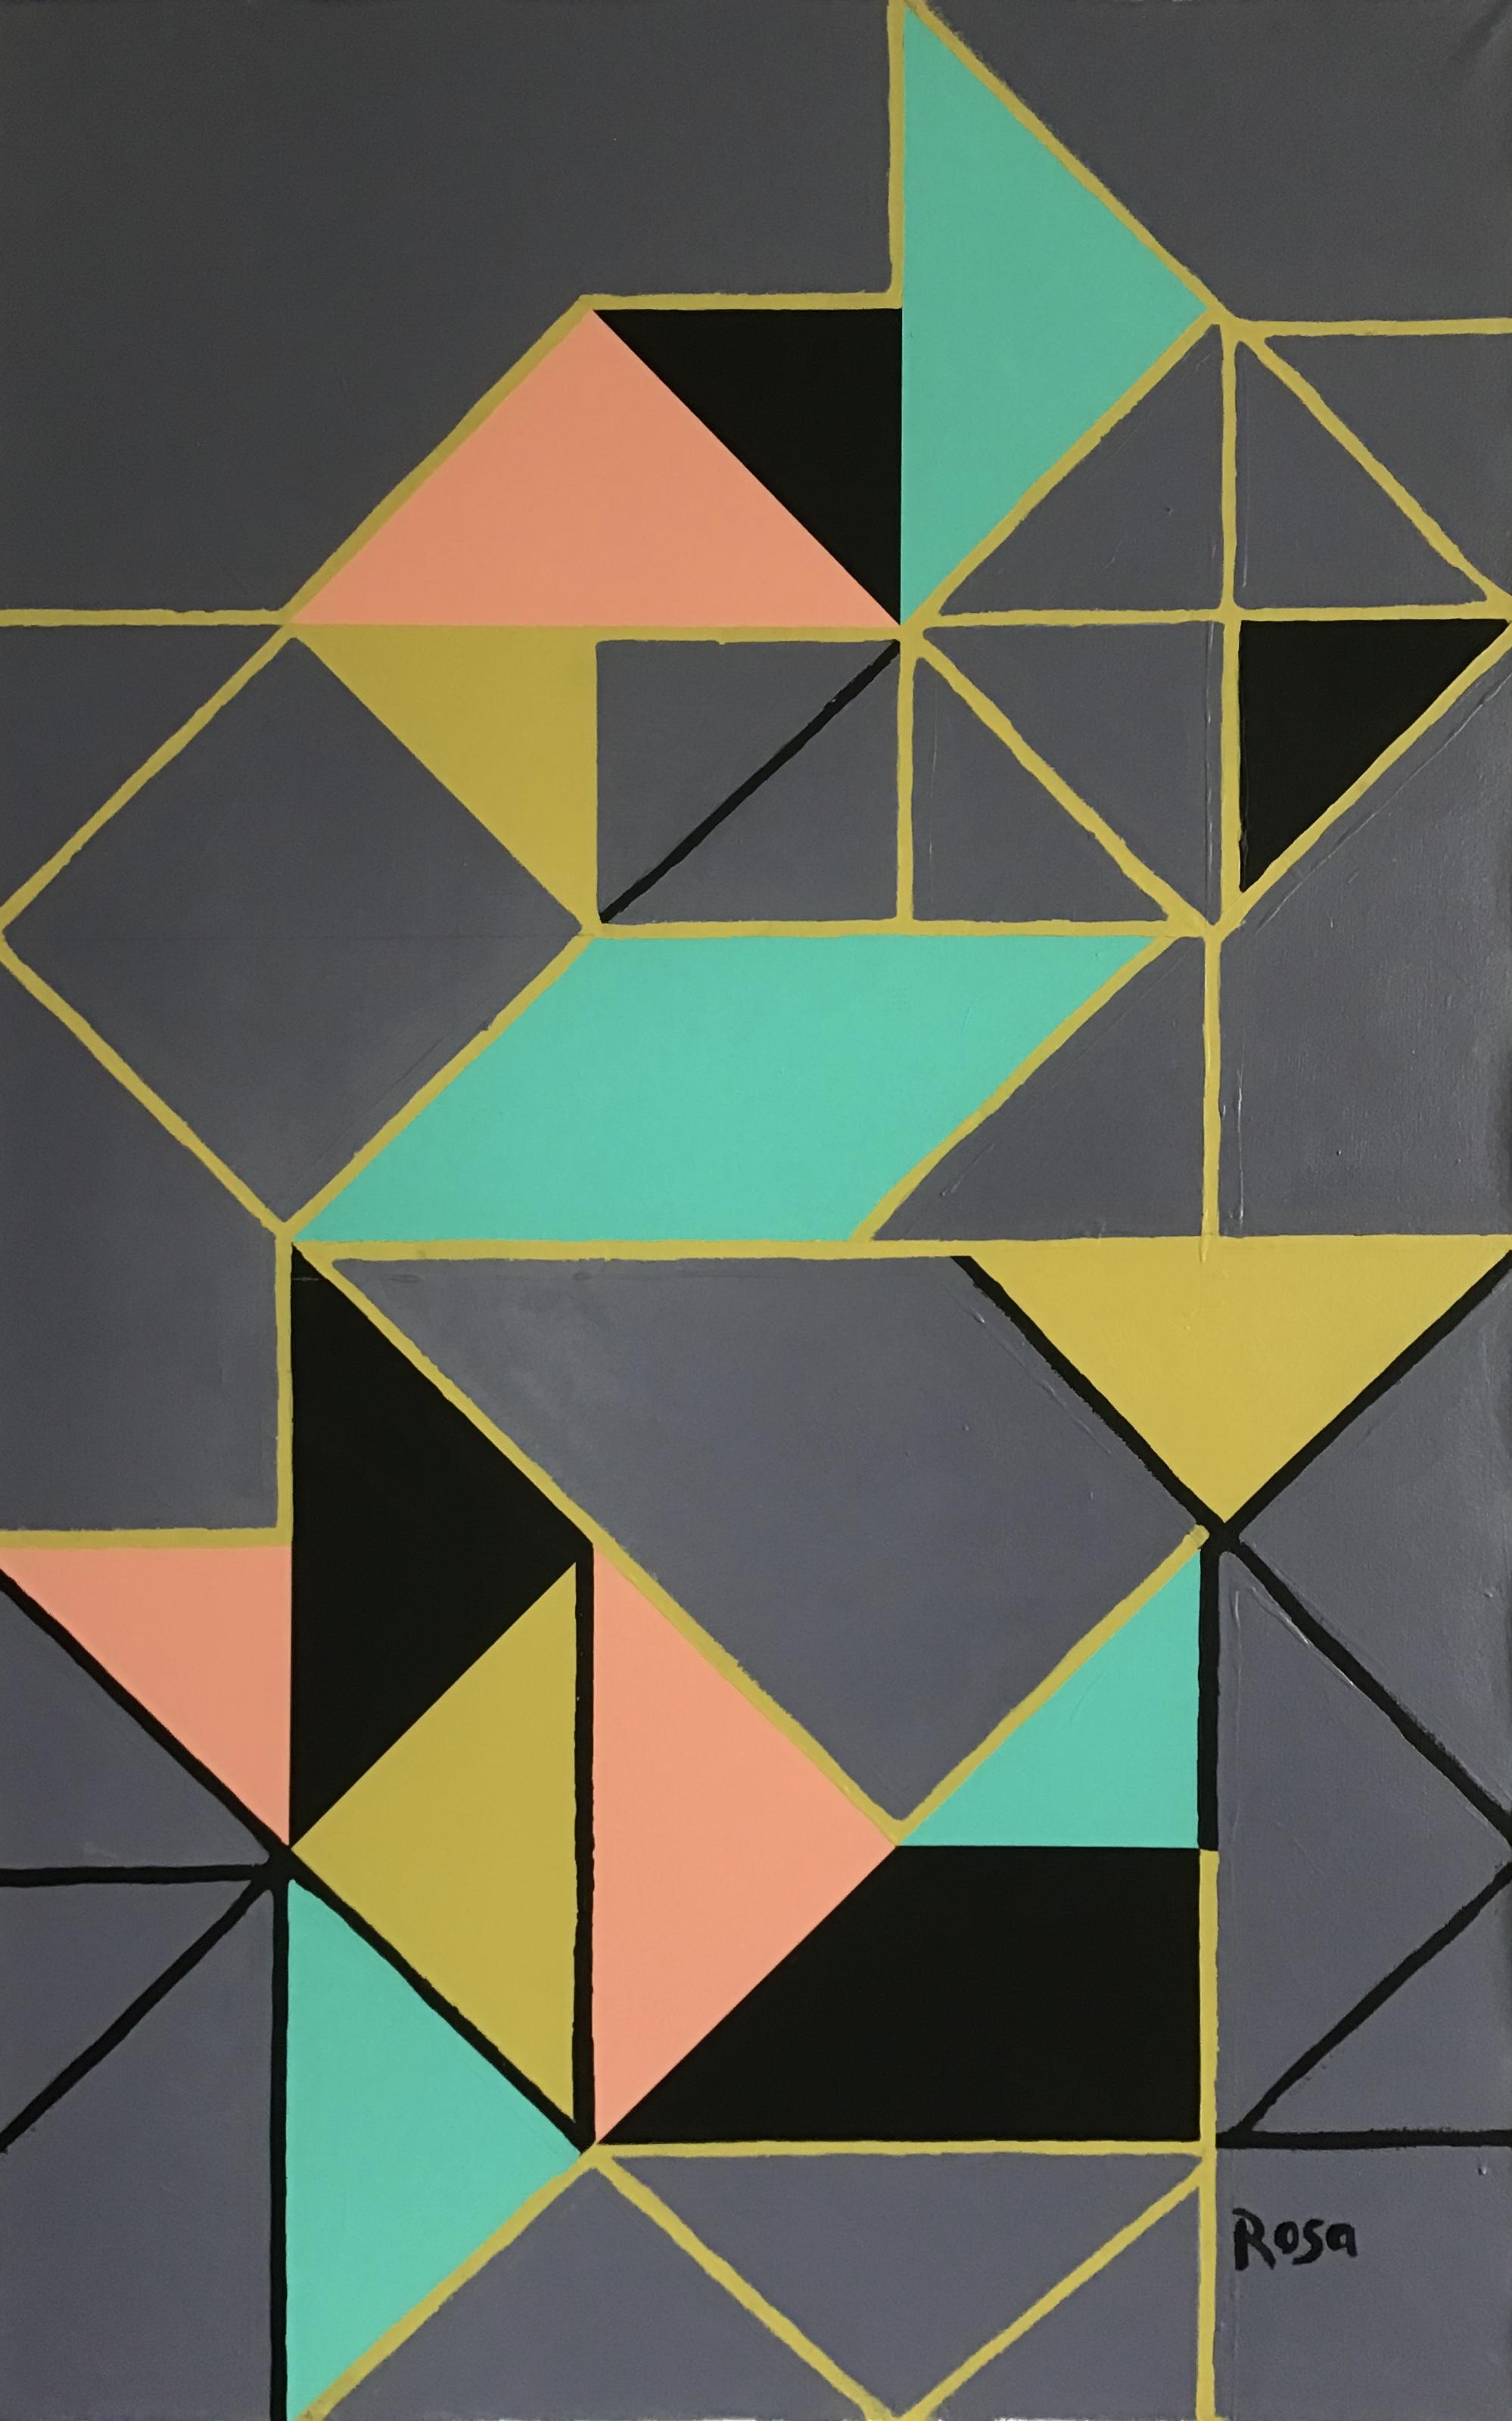 Triangular Perceptions #